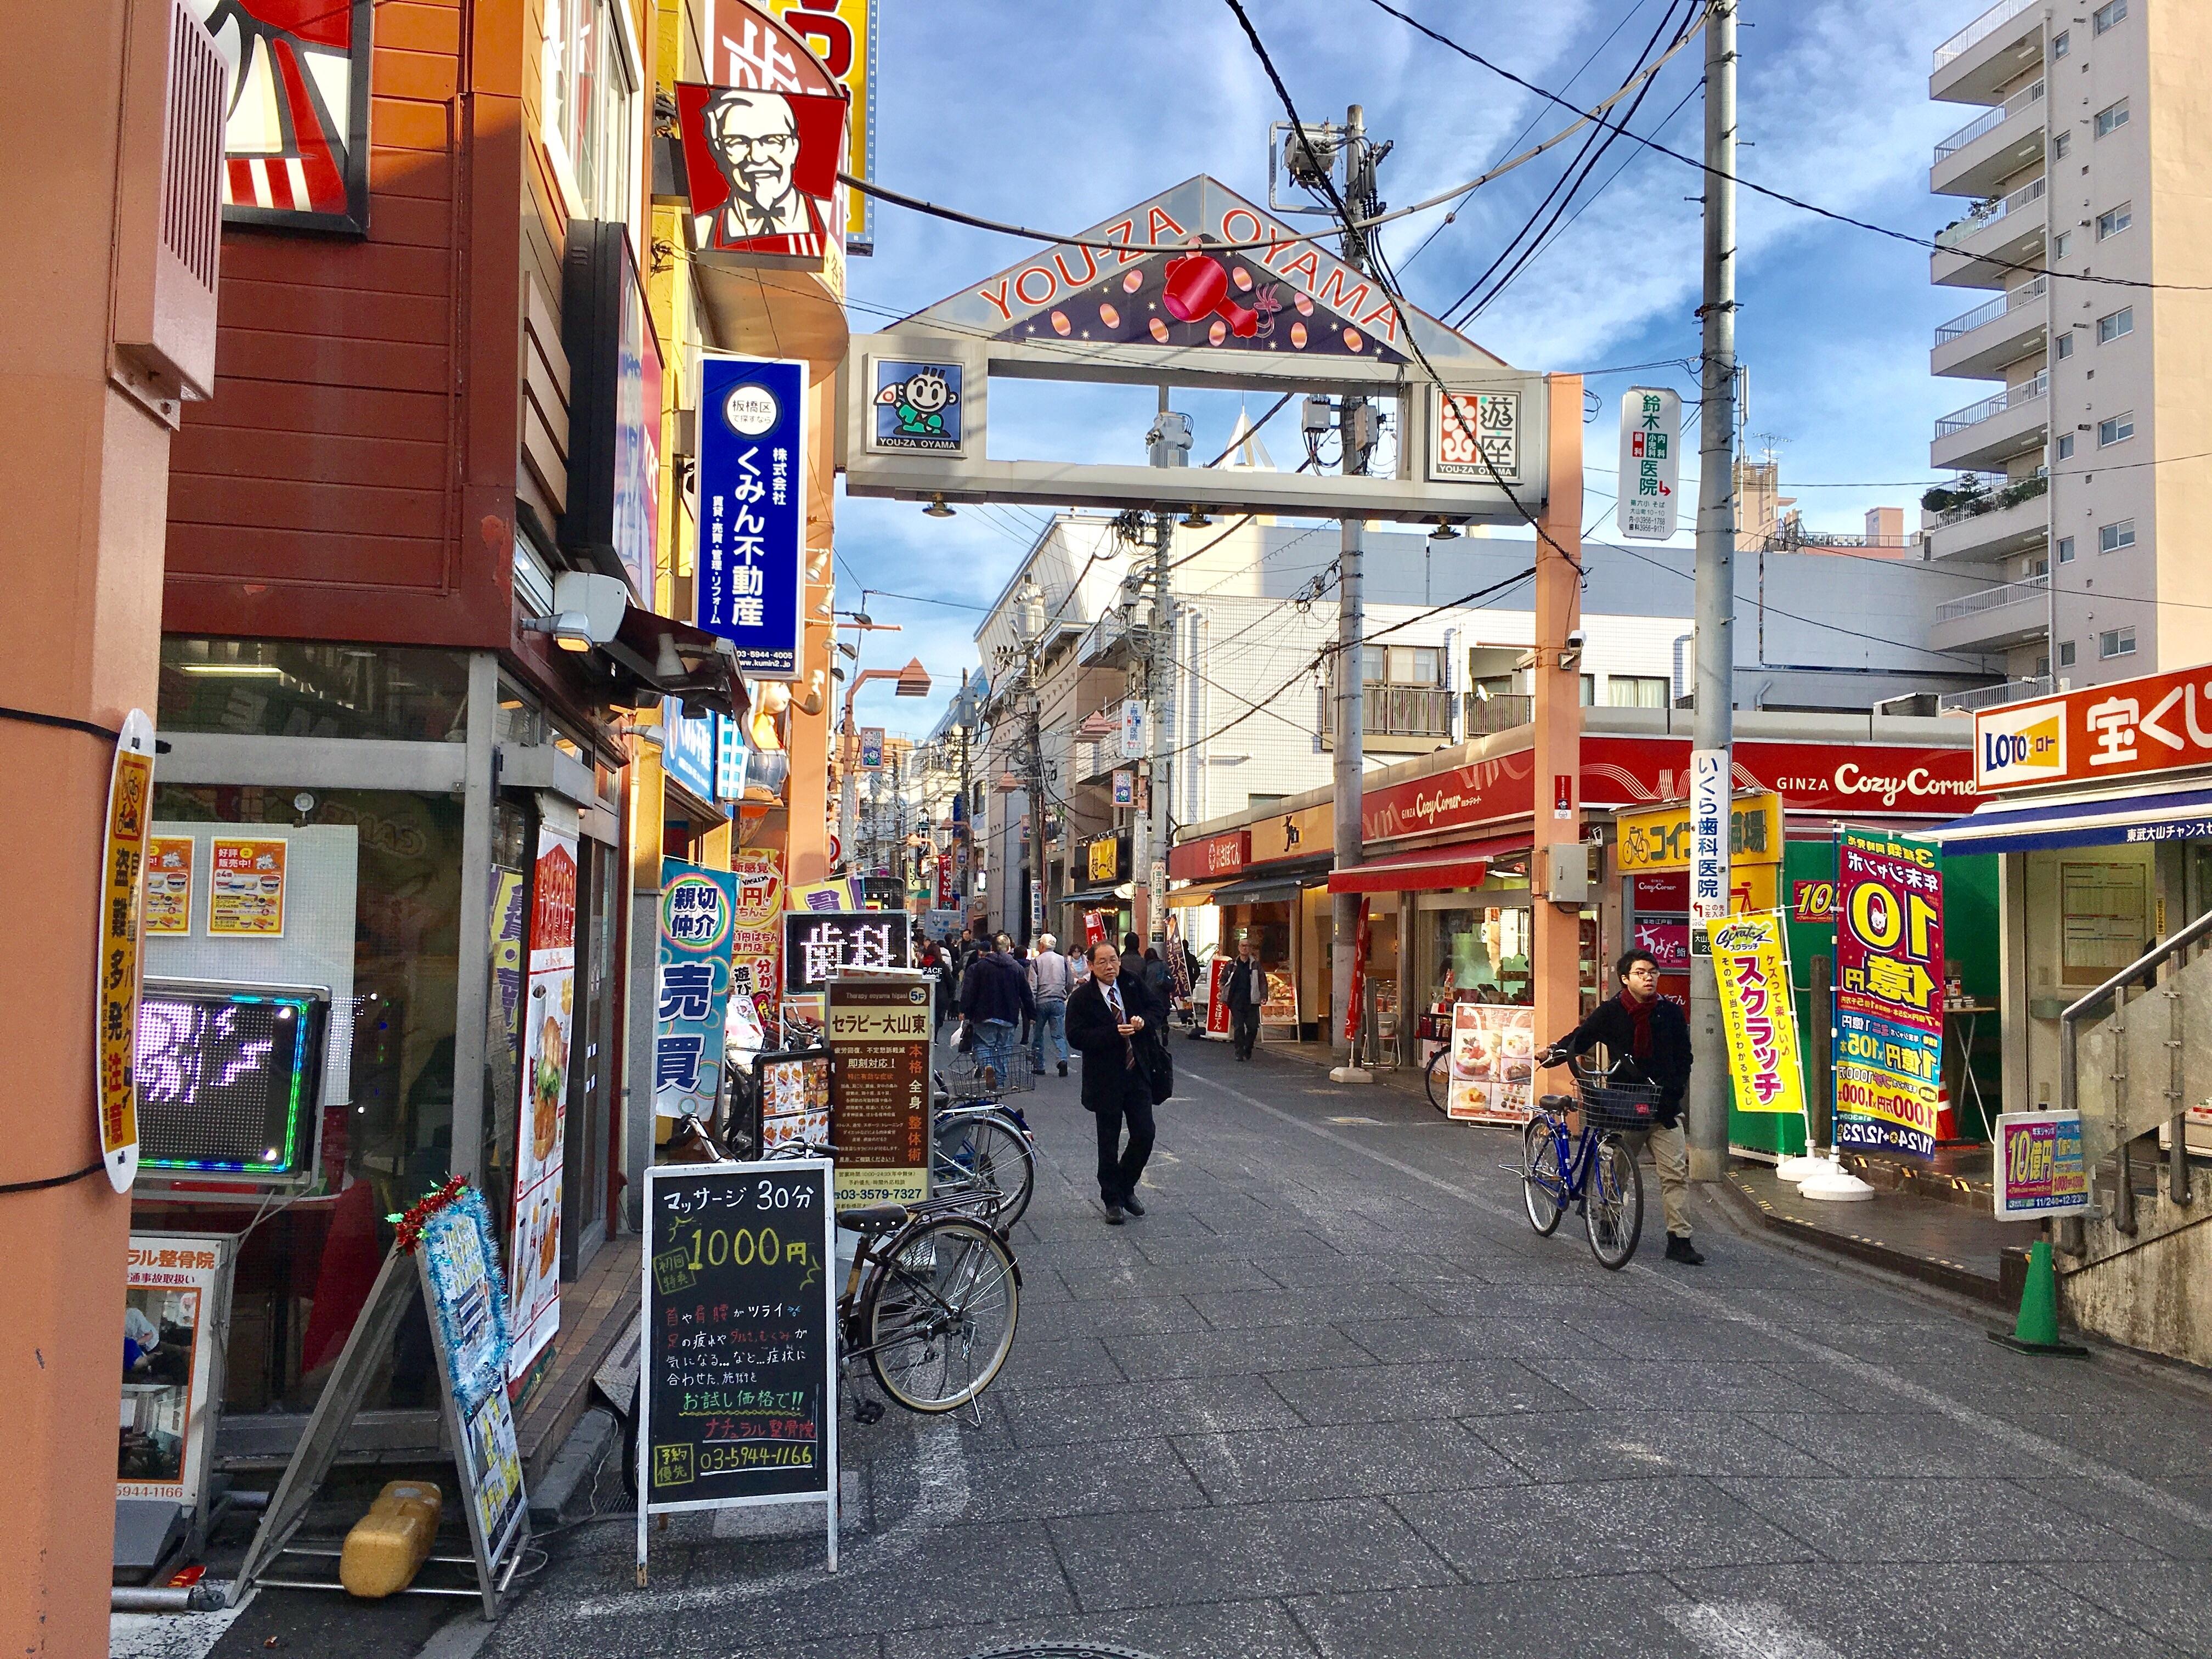 f:id:SoichiroIkeshita:20170219214938j:image